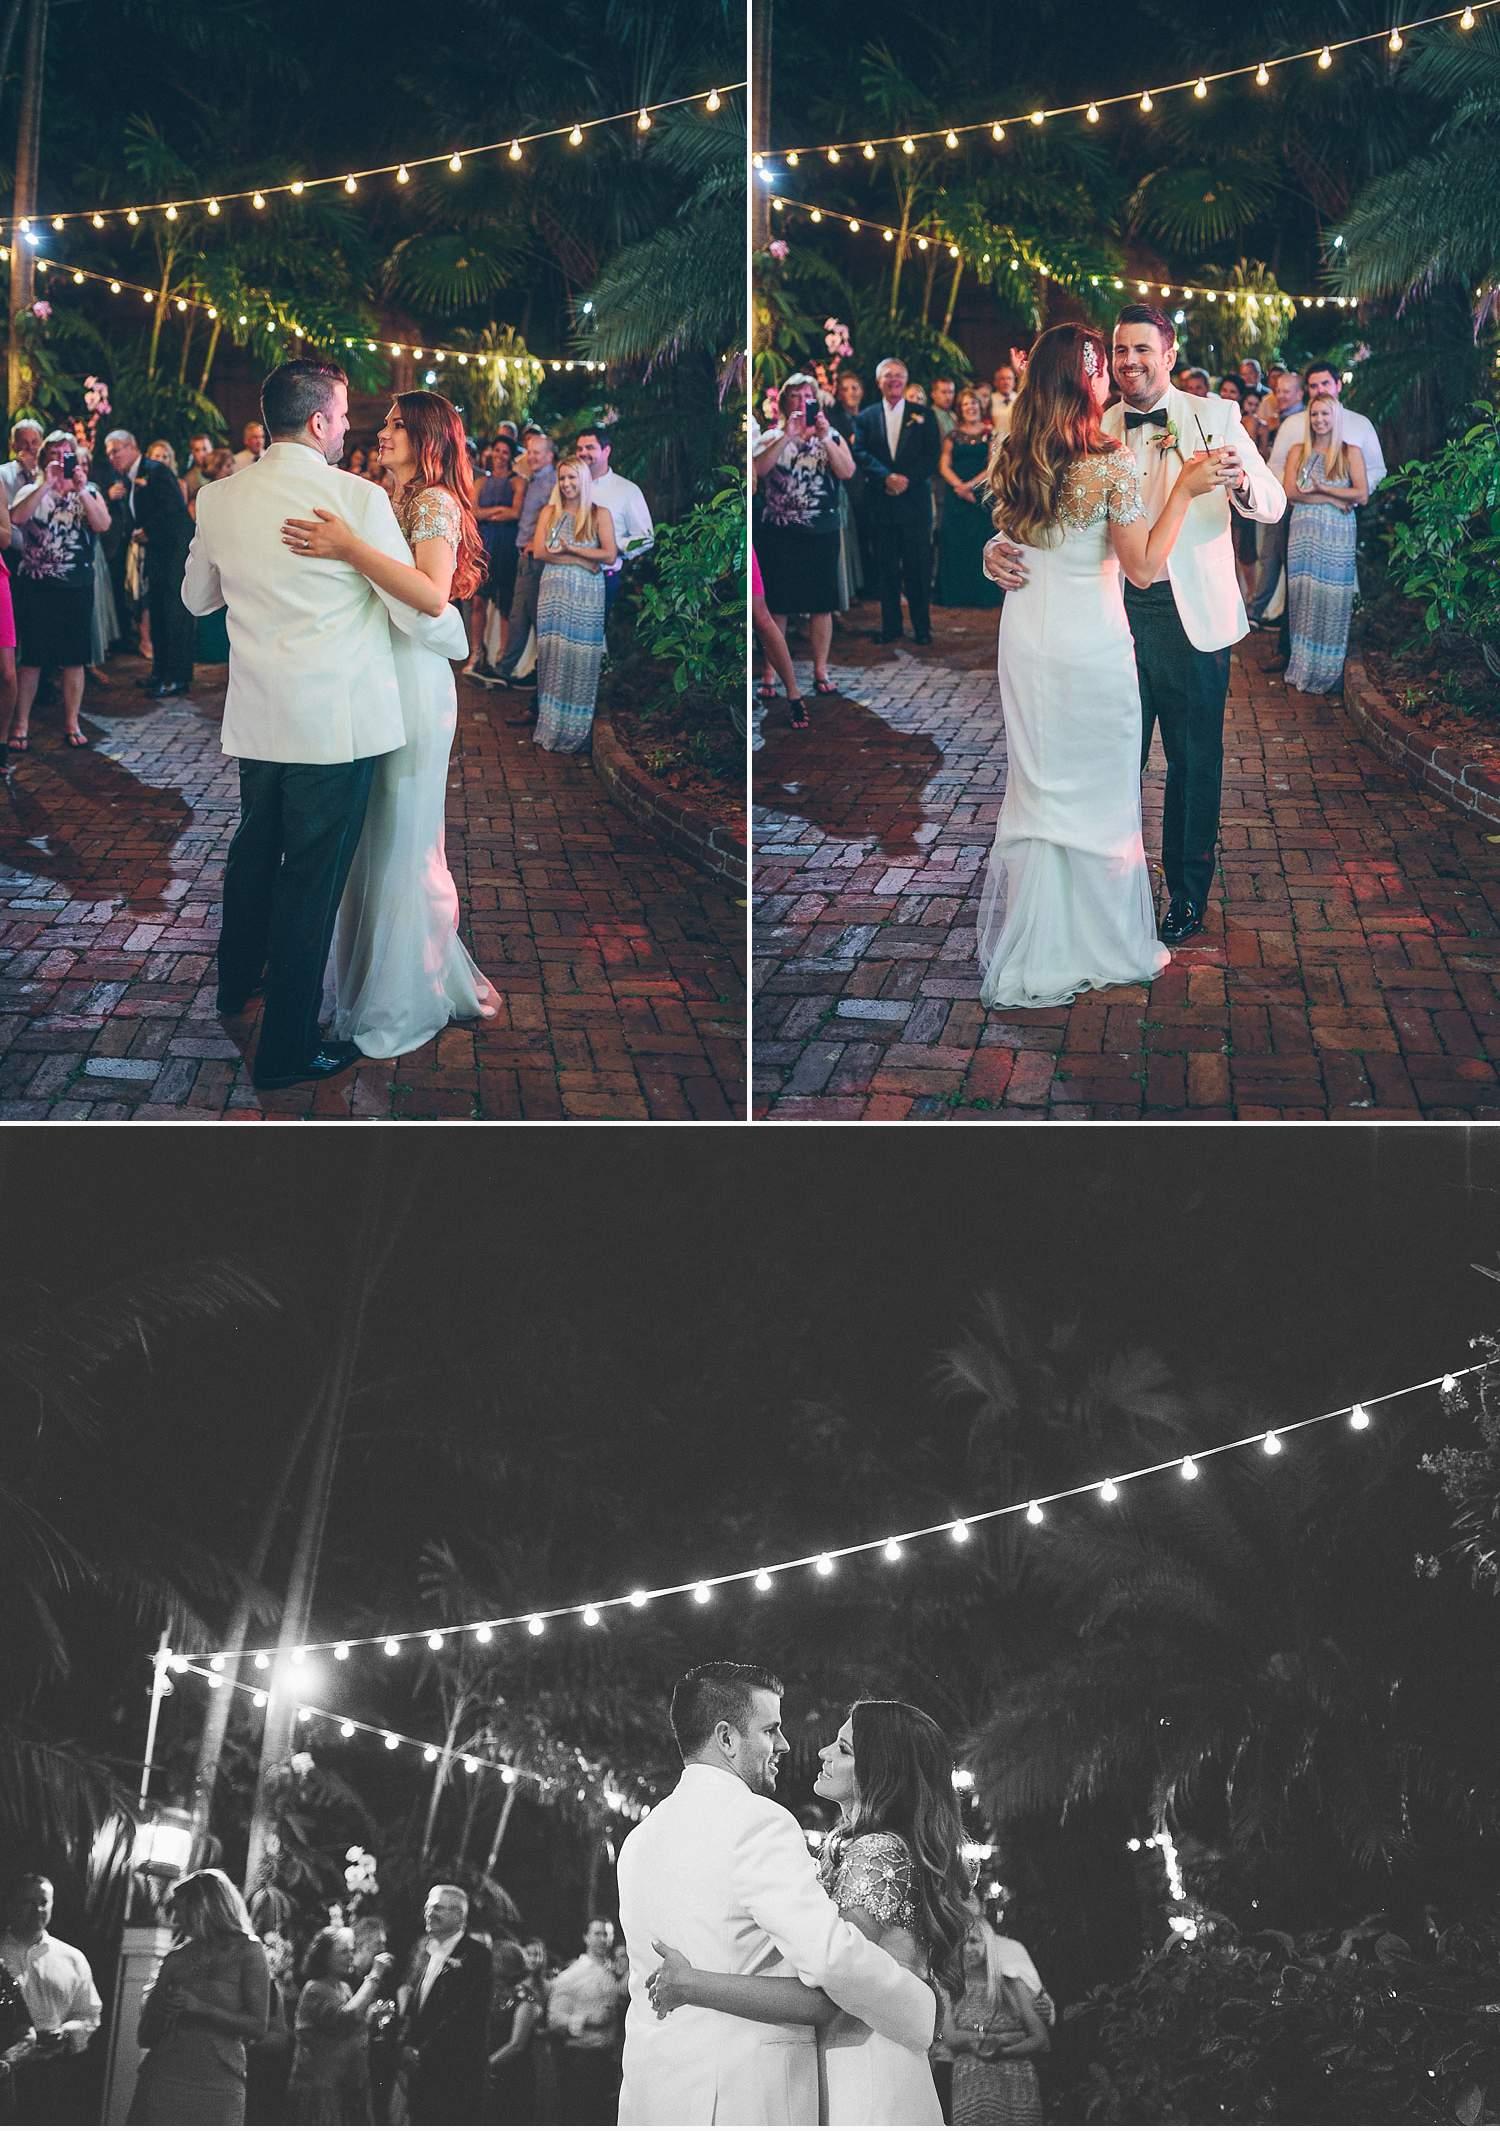 audubon-house-key-west-wedding-photographer-daniel-lateulade-0032.JPG